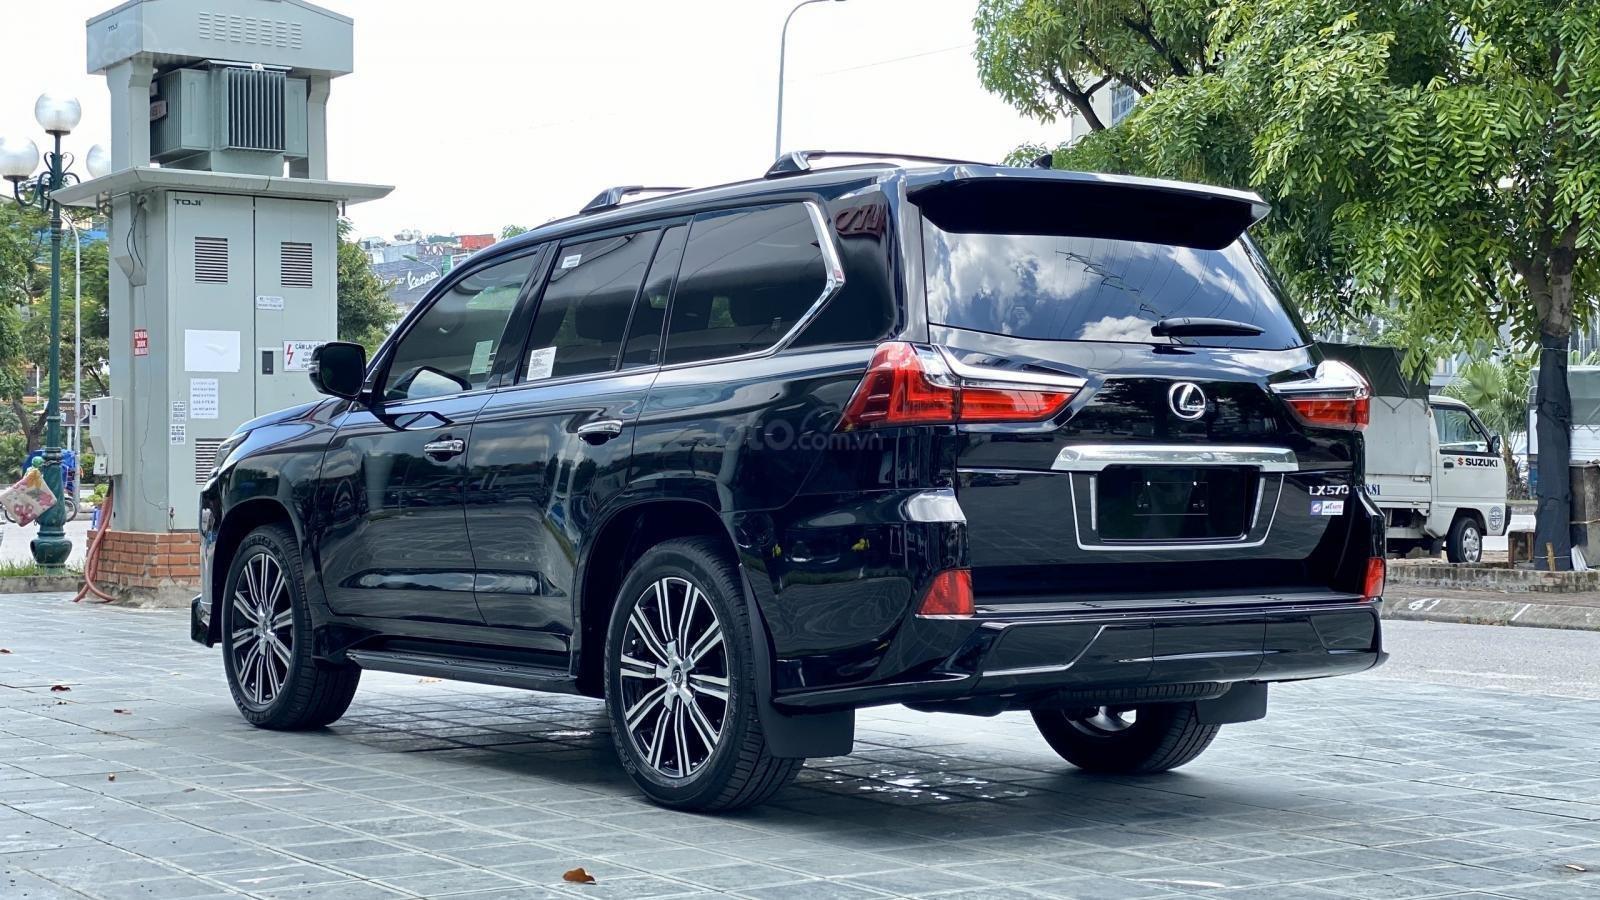 Bán Lexus LX 570s Supper Sport SX 2020, màu đen, xe nhập Mỹ mới 100% (6)